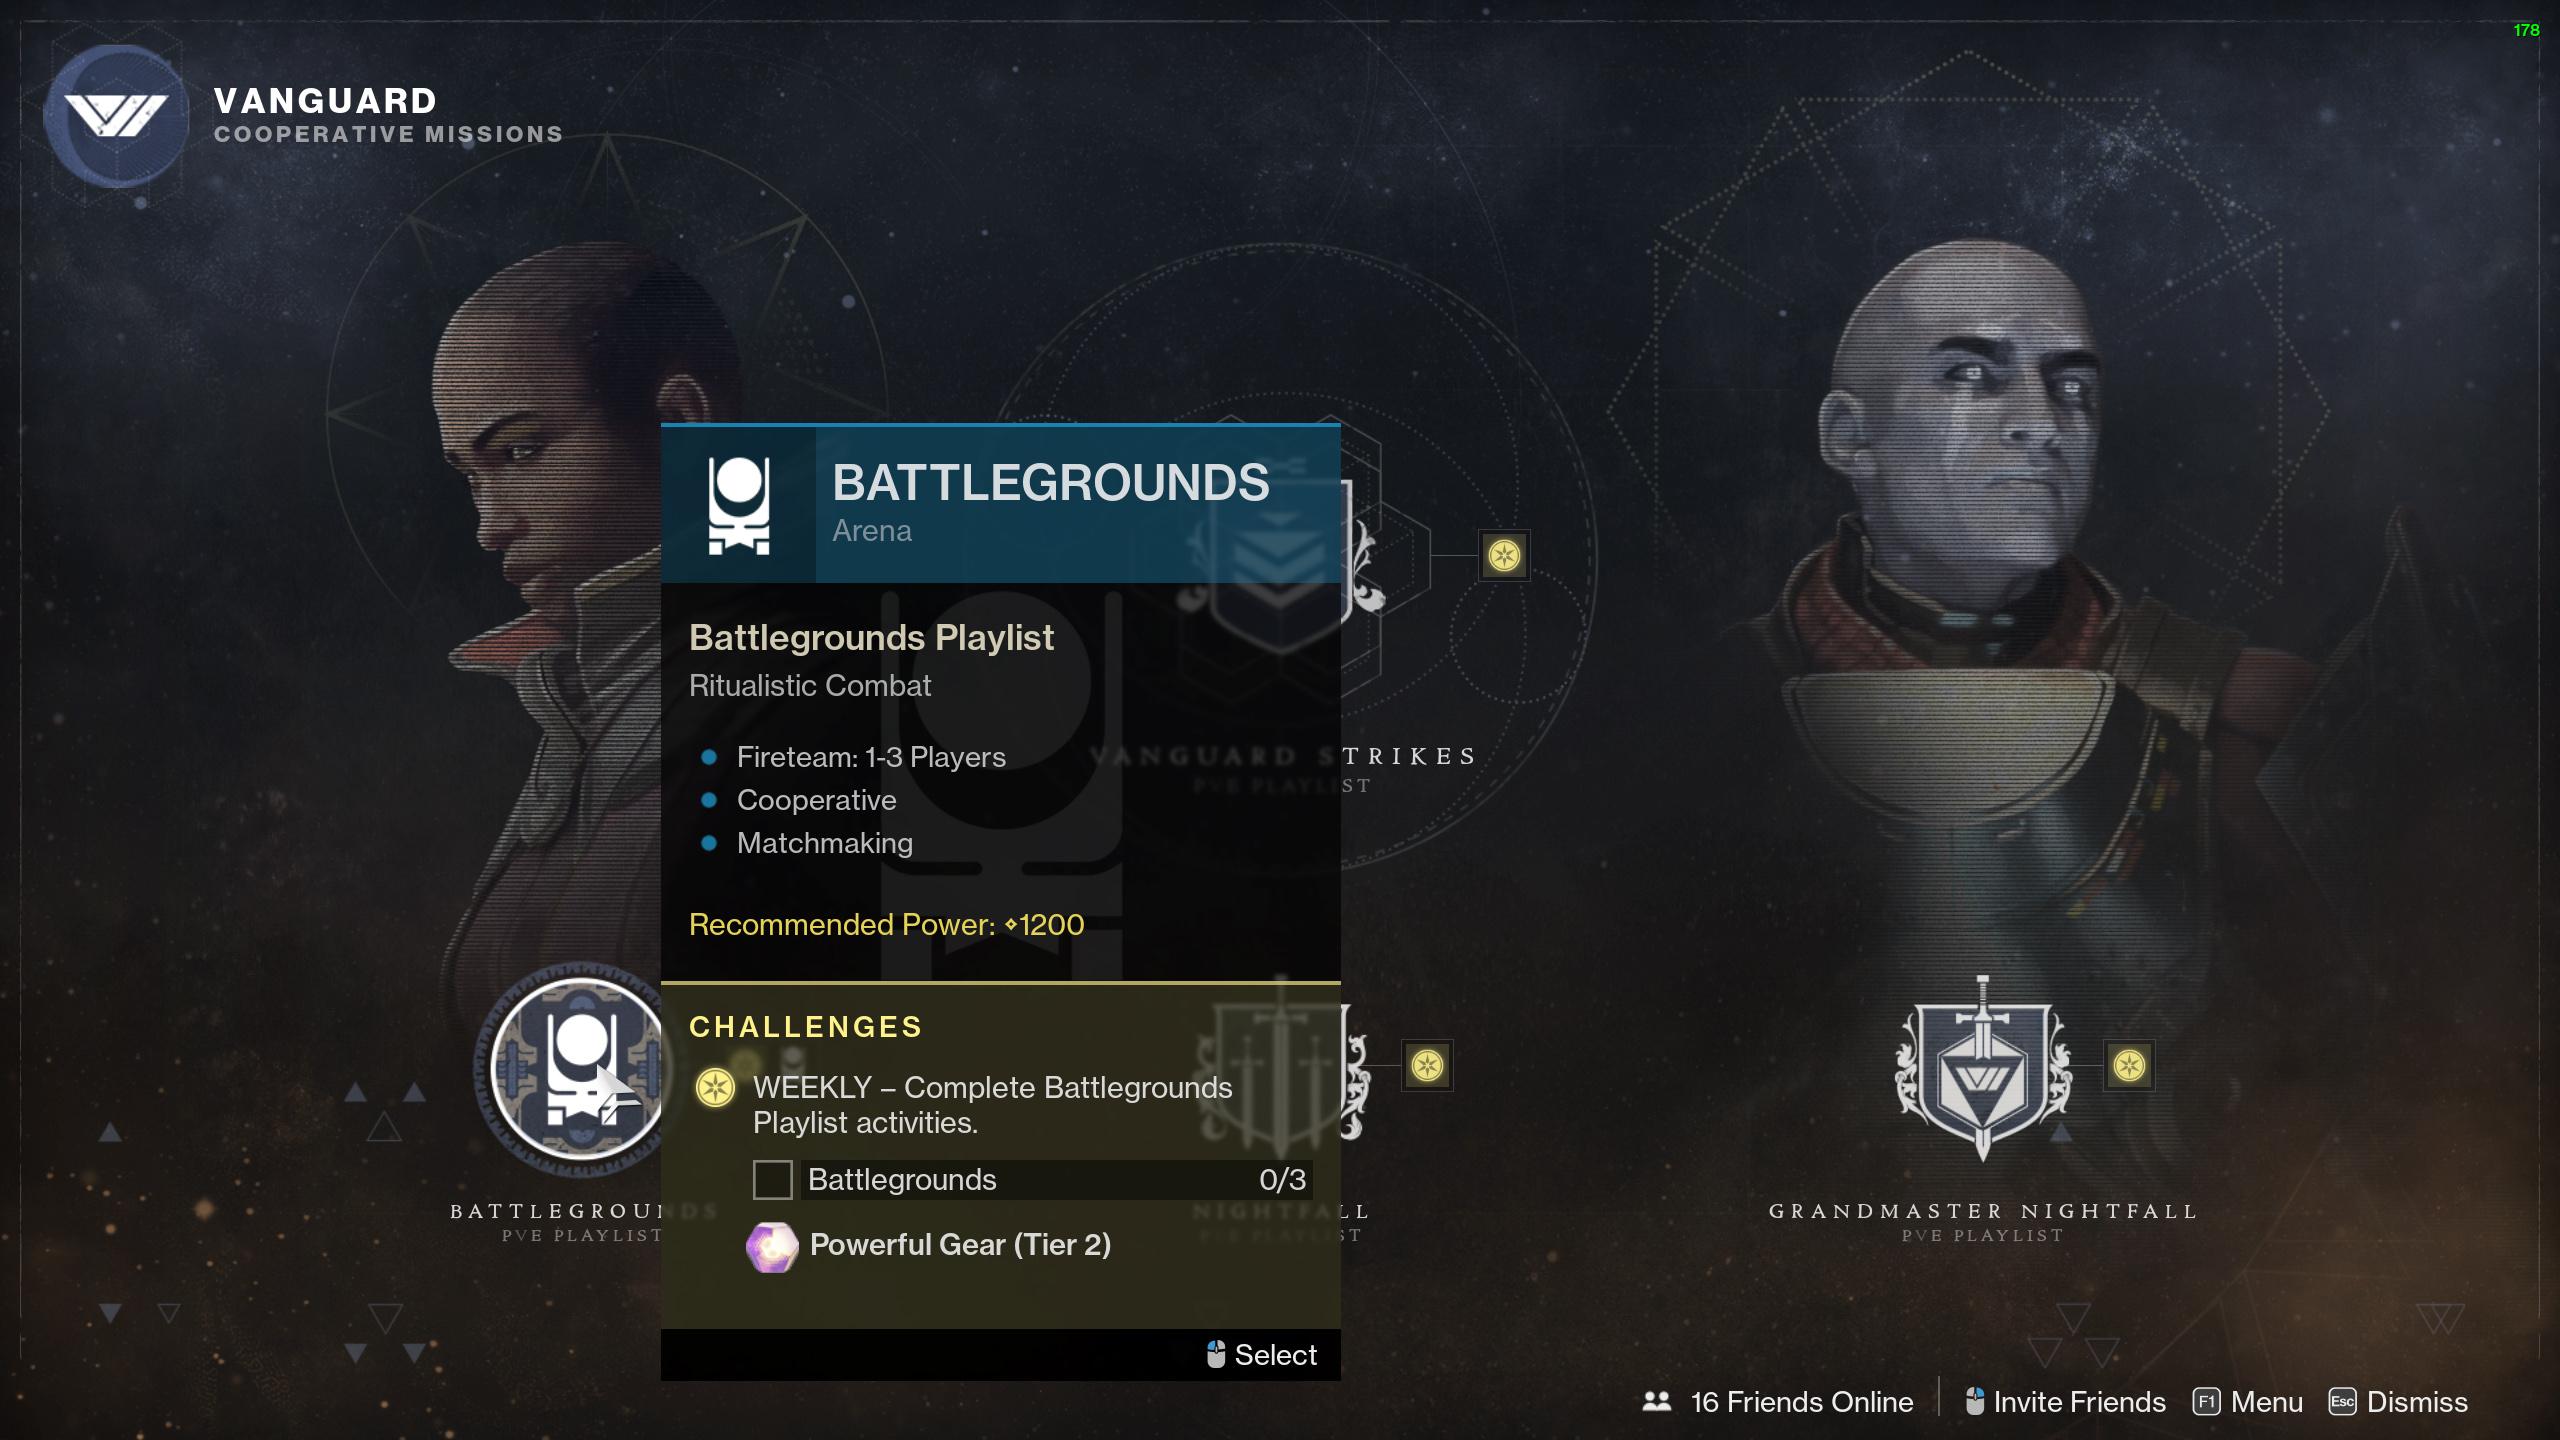 destiny 2 season of the chosen battleground playlist